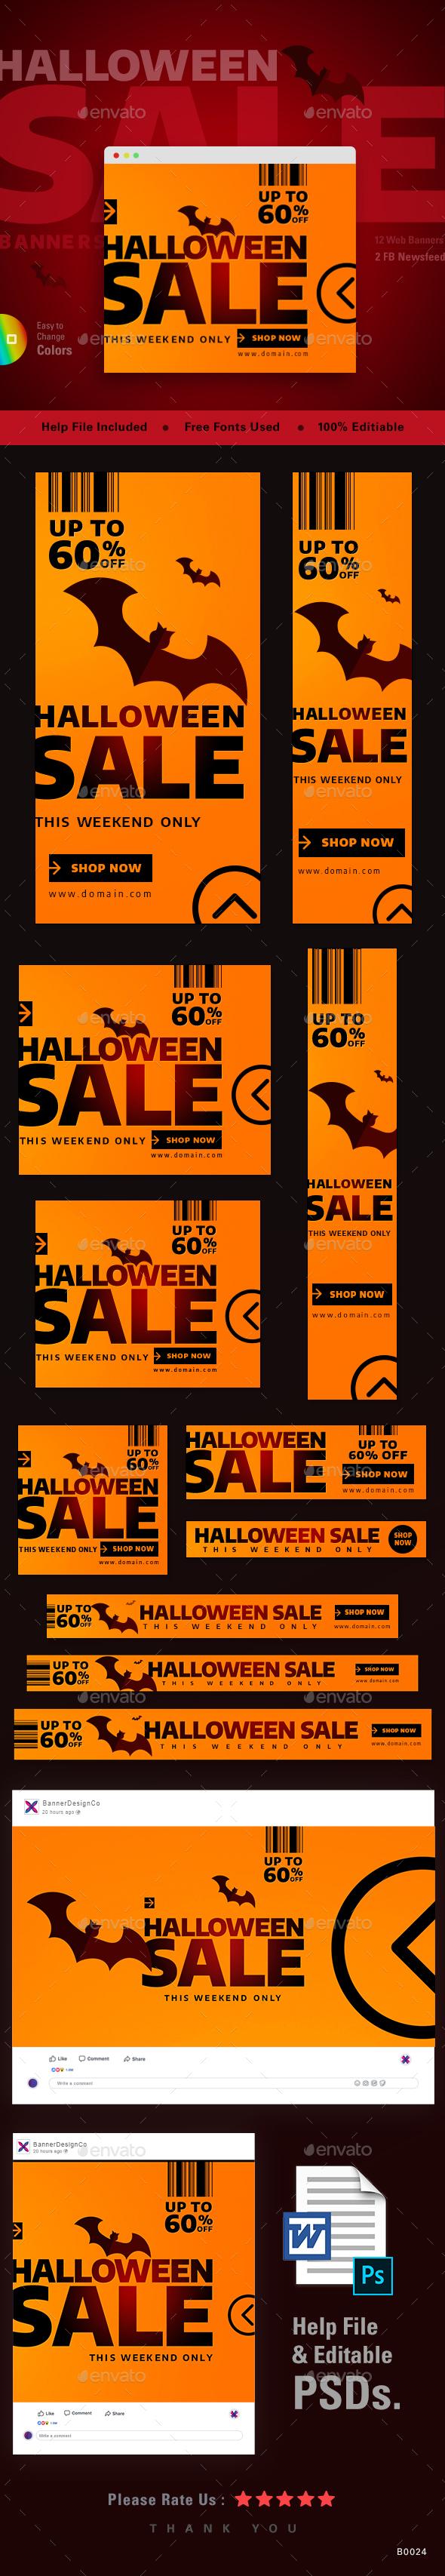 Halloween Web Banner Set - Banners & Ads Web Elements